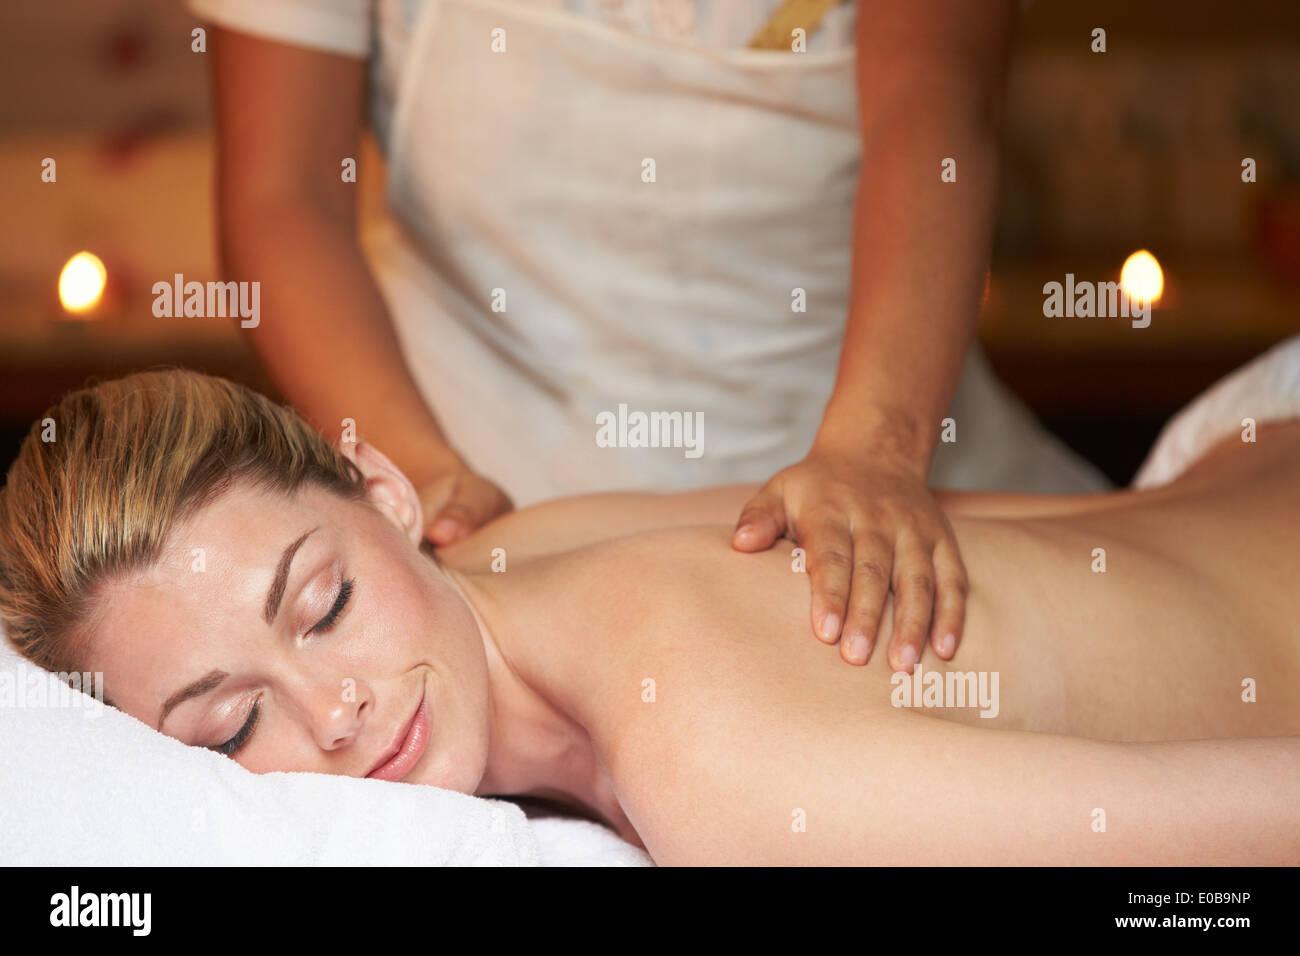 Woman Having Massage In Spa - Stock Image